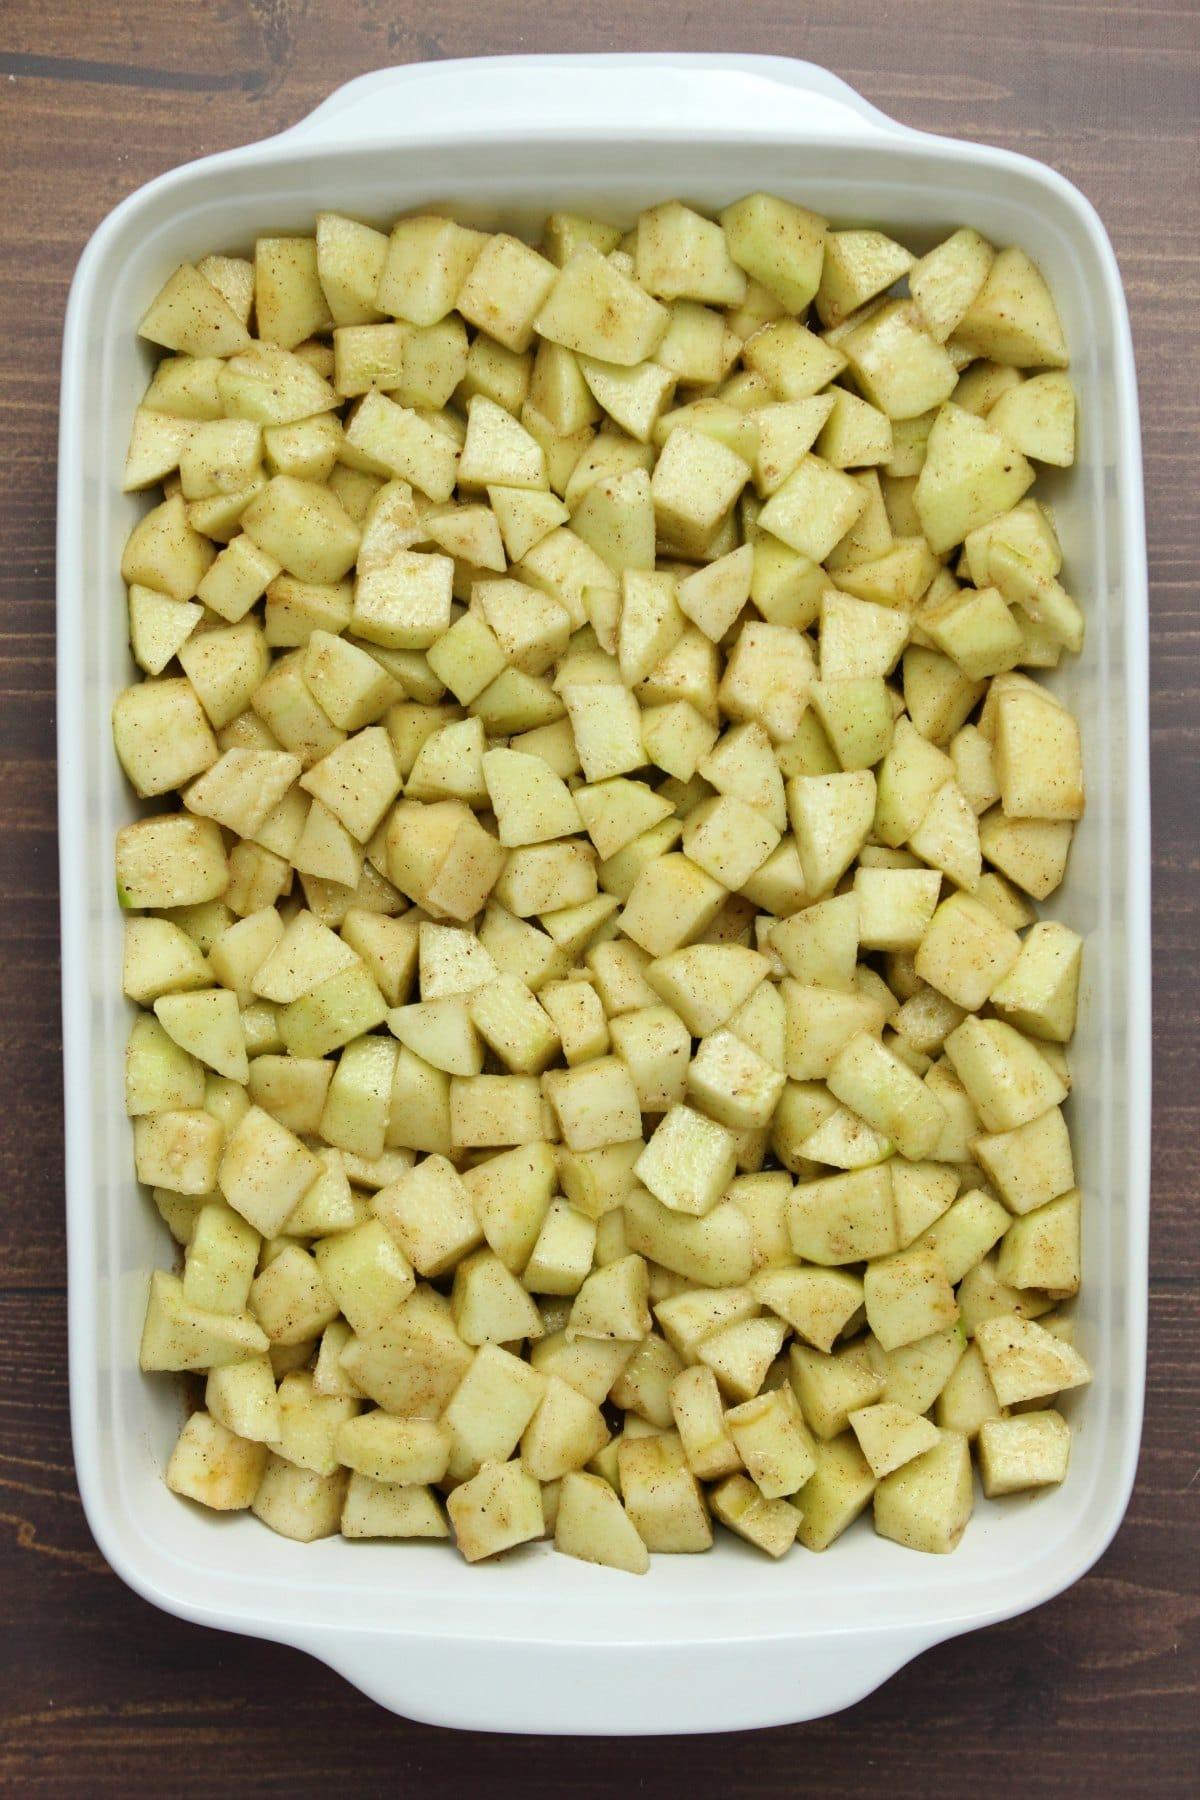 Chopped apple filling for apple crisp in a white rectangle baking dish.